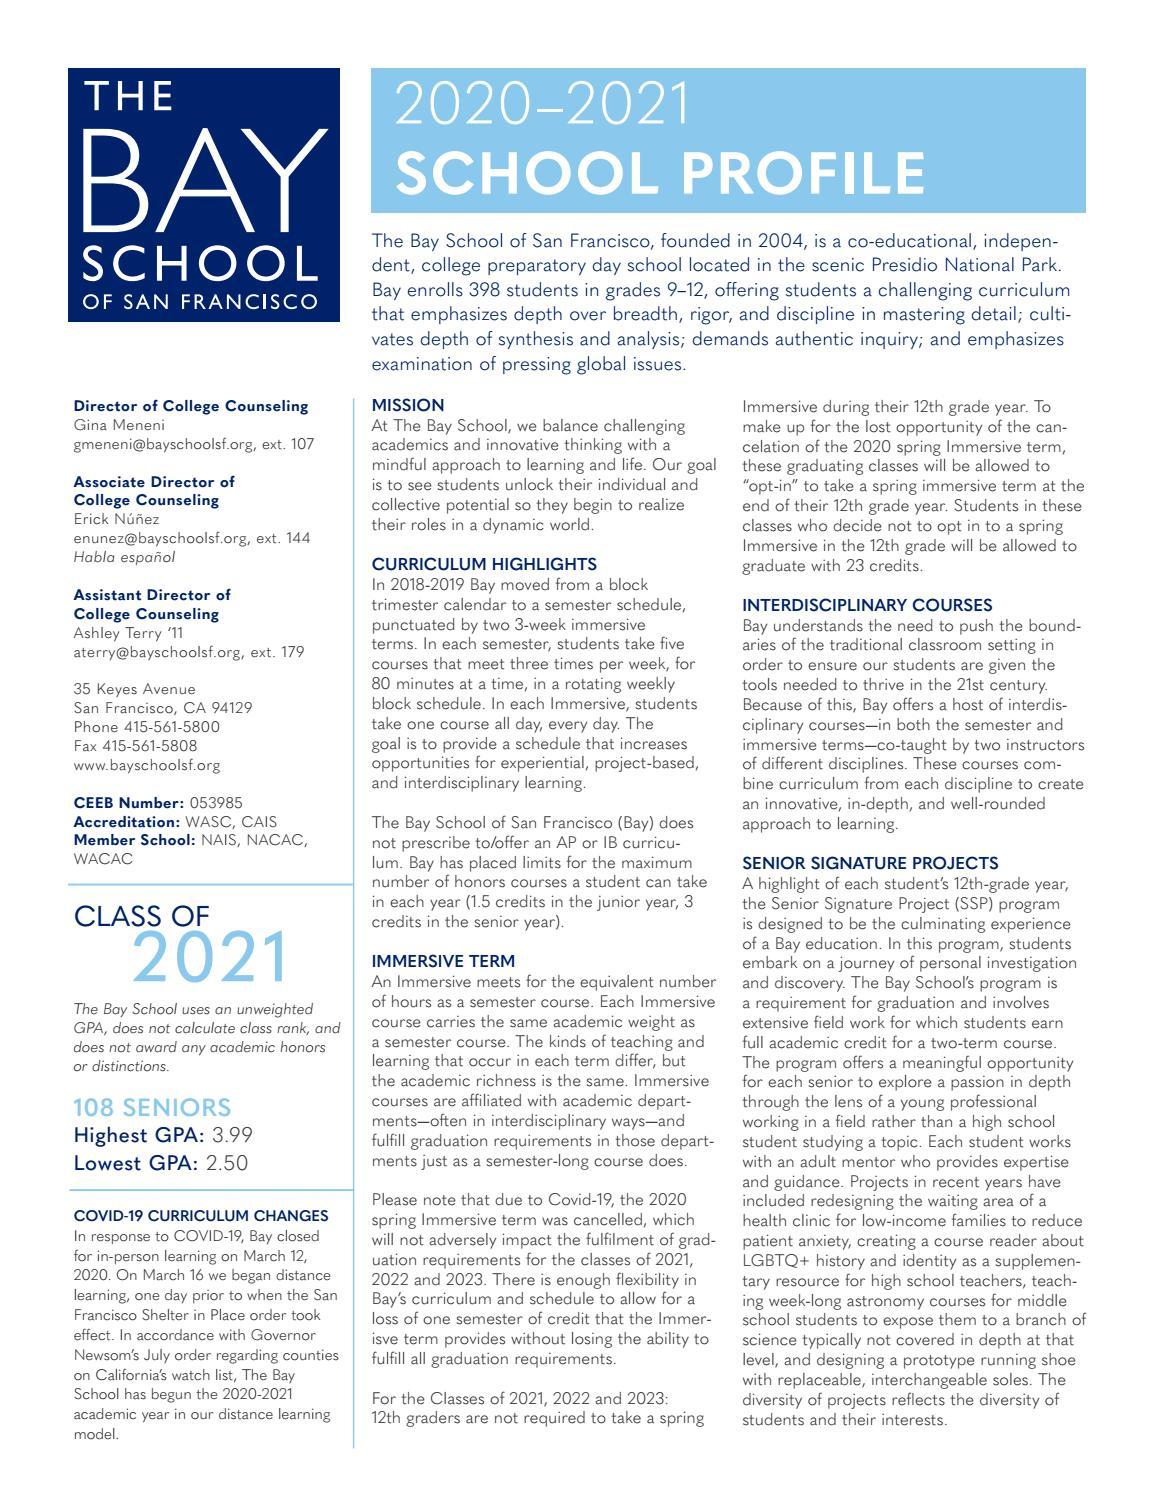 Ithaca College Academic Calendar Spring 2022.2020 2021 Bay School Profile By The Bay School Of San Francisco Issuu